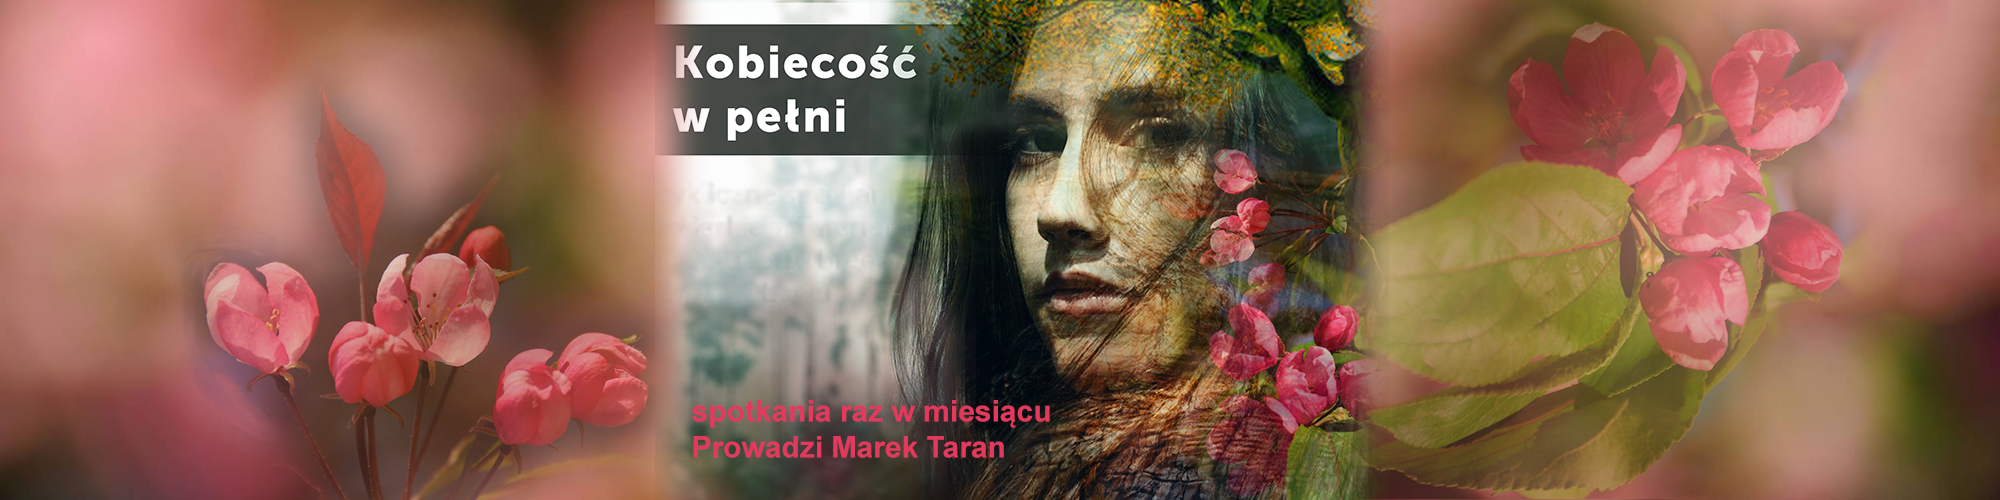 kobiecoscwpelni-banner